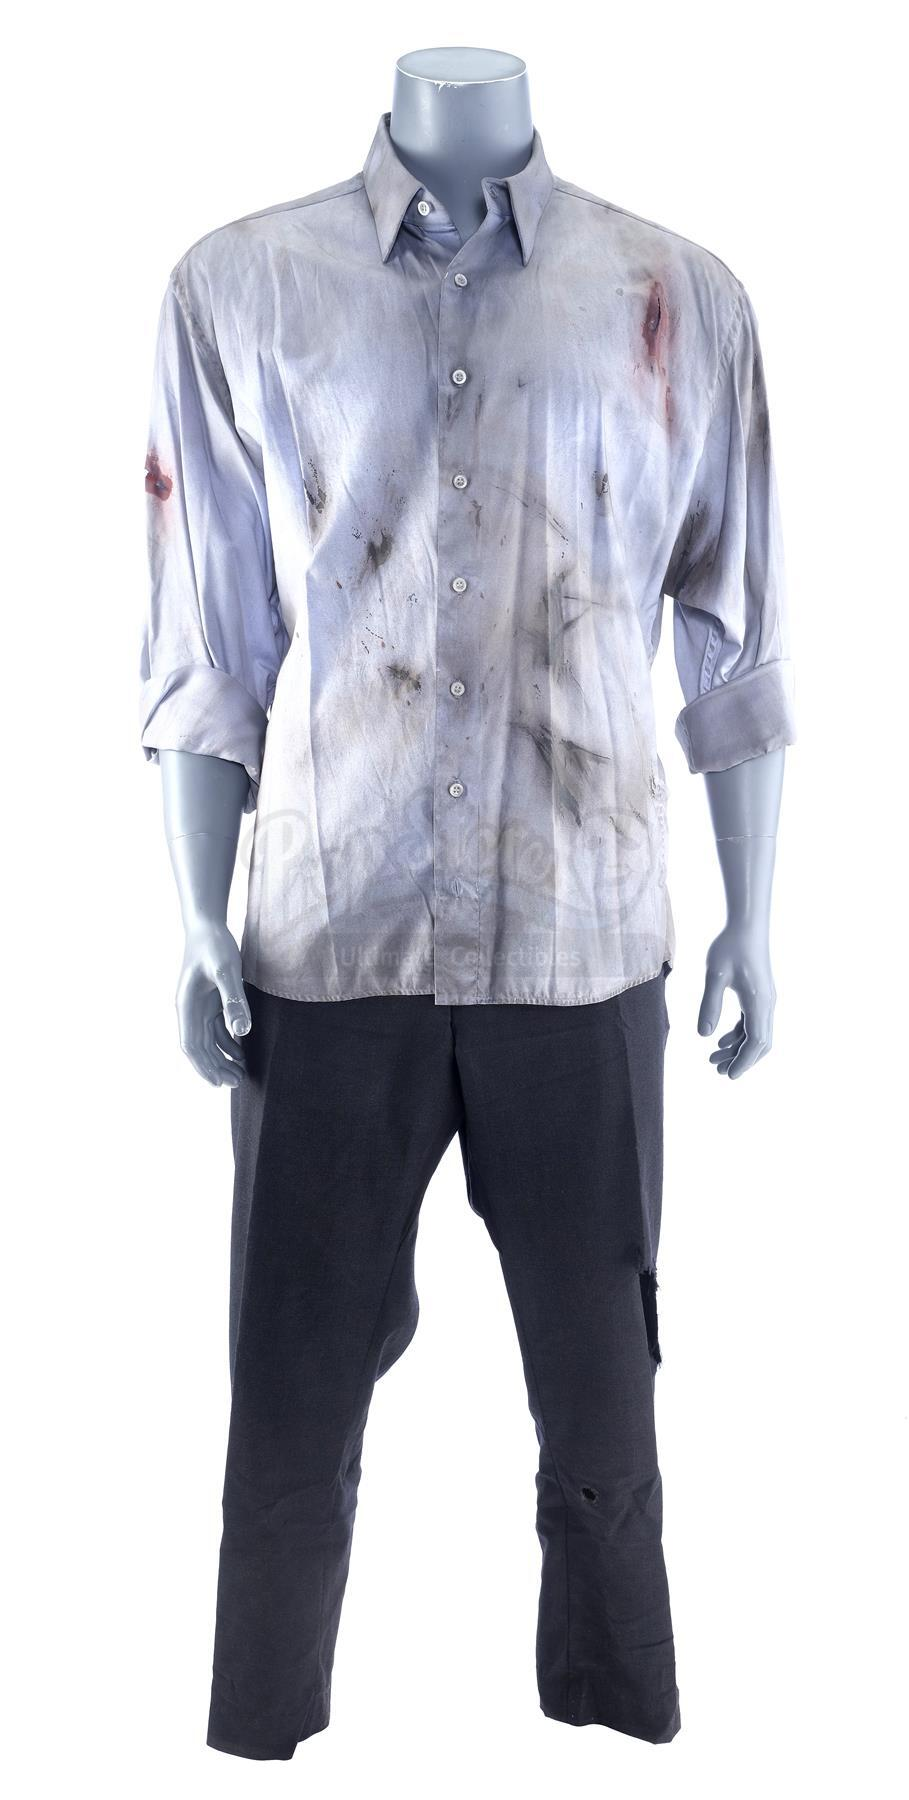 Lot # 1030: SKYSCRAPER - Will Sawyer's (Dwayne Johnson) Distressed Costume